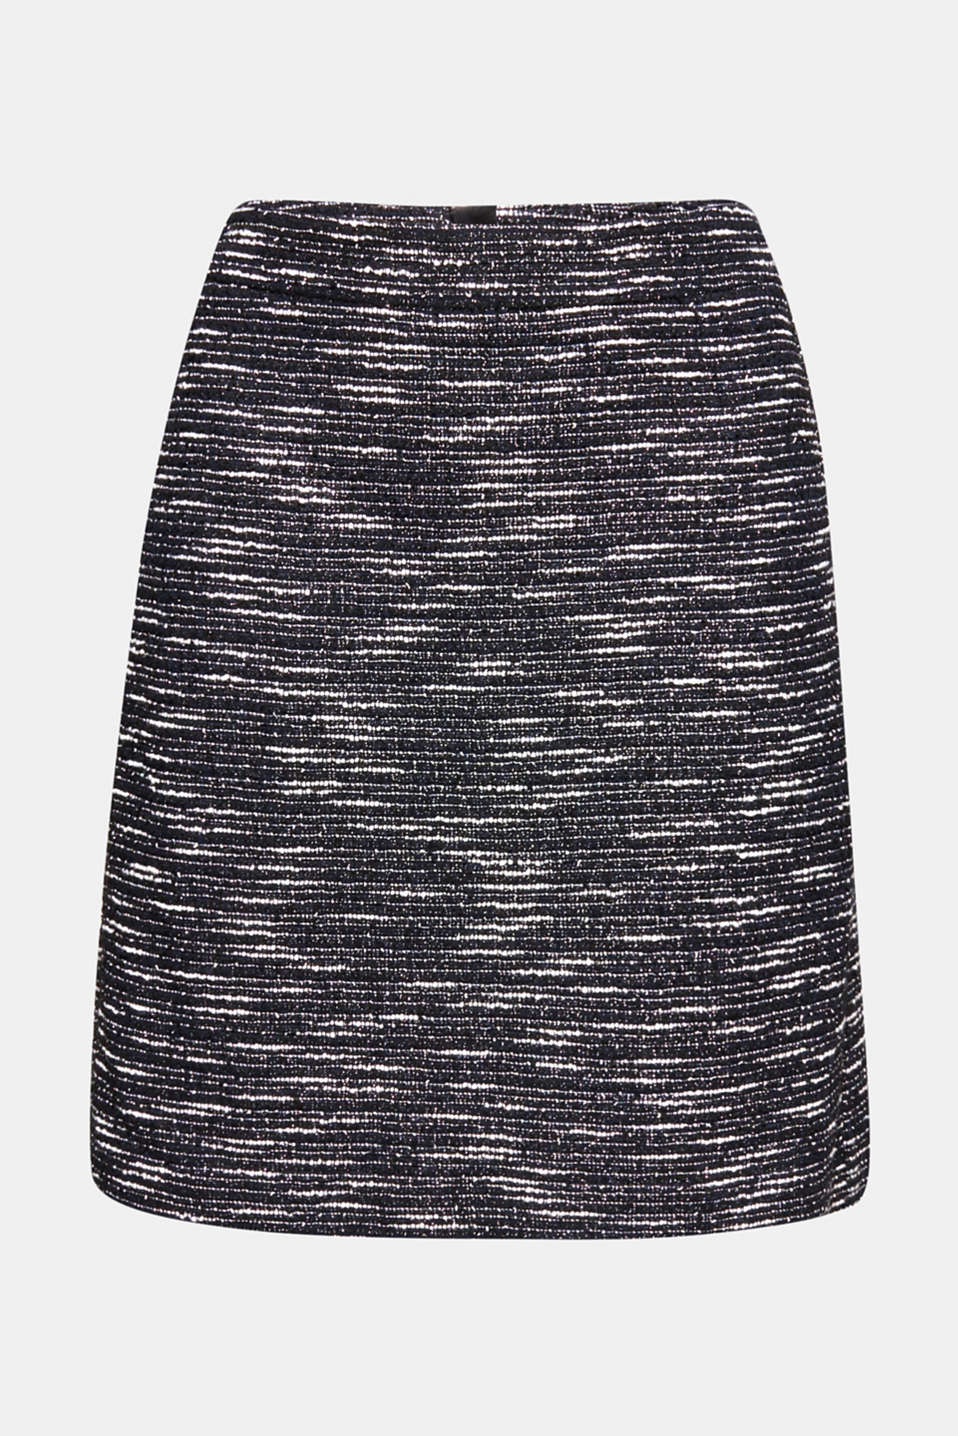 Bi-colour glittering bouclé skirt, BLACK, detail image number 7